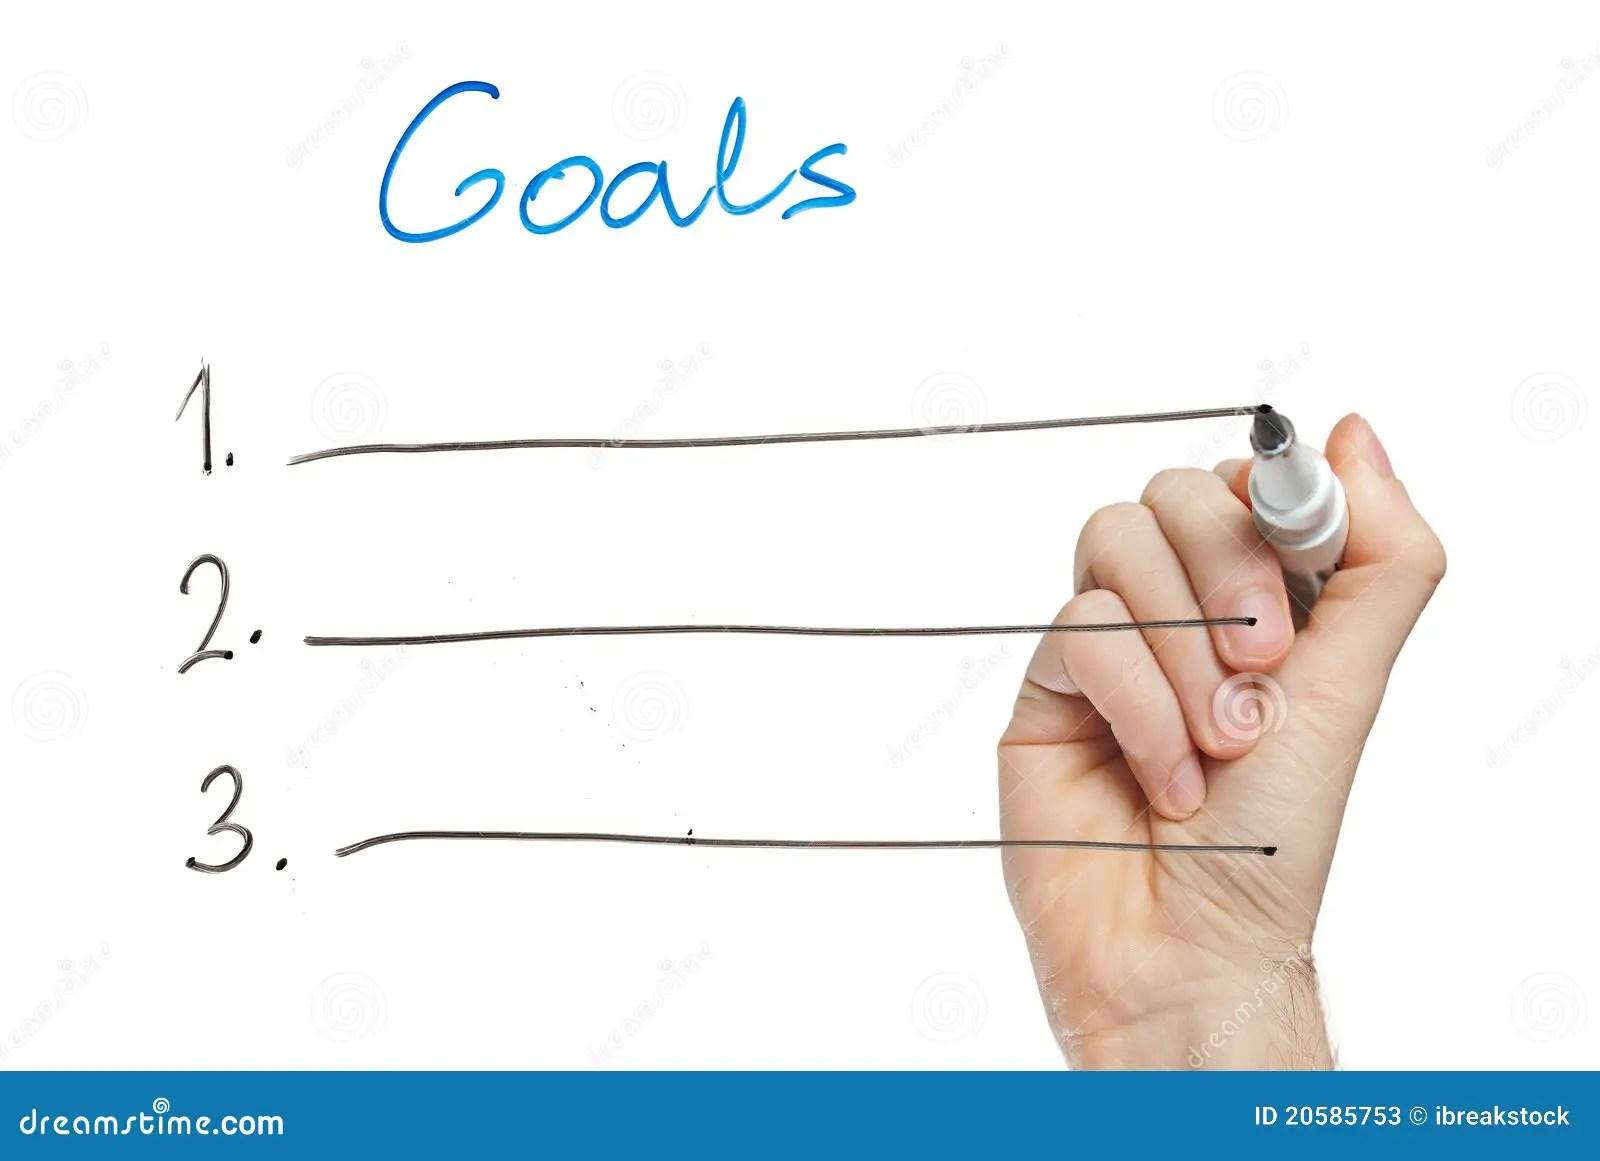 Hand Writing Goals On Whiteboard Stock Image